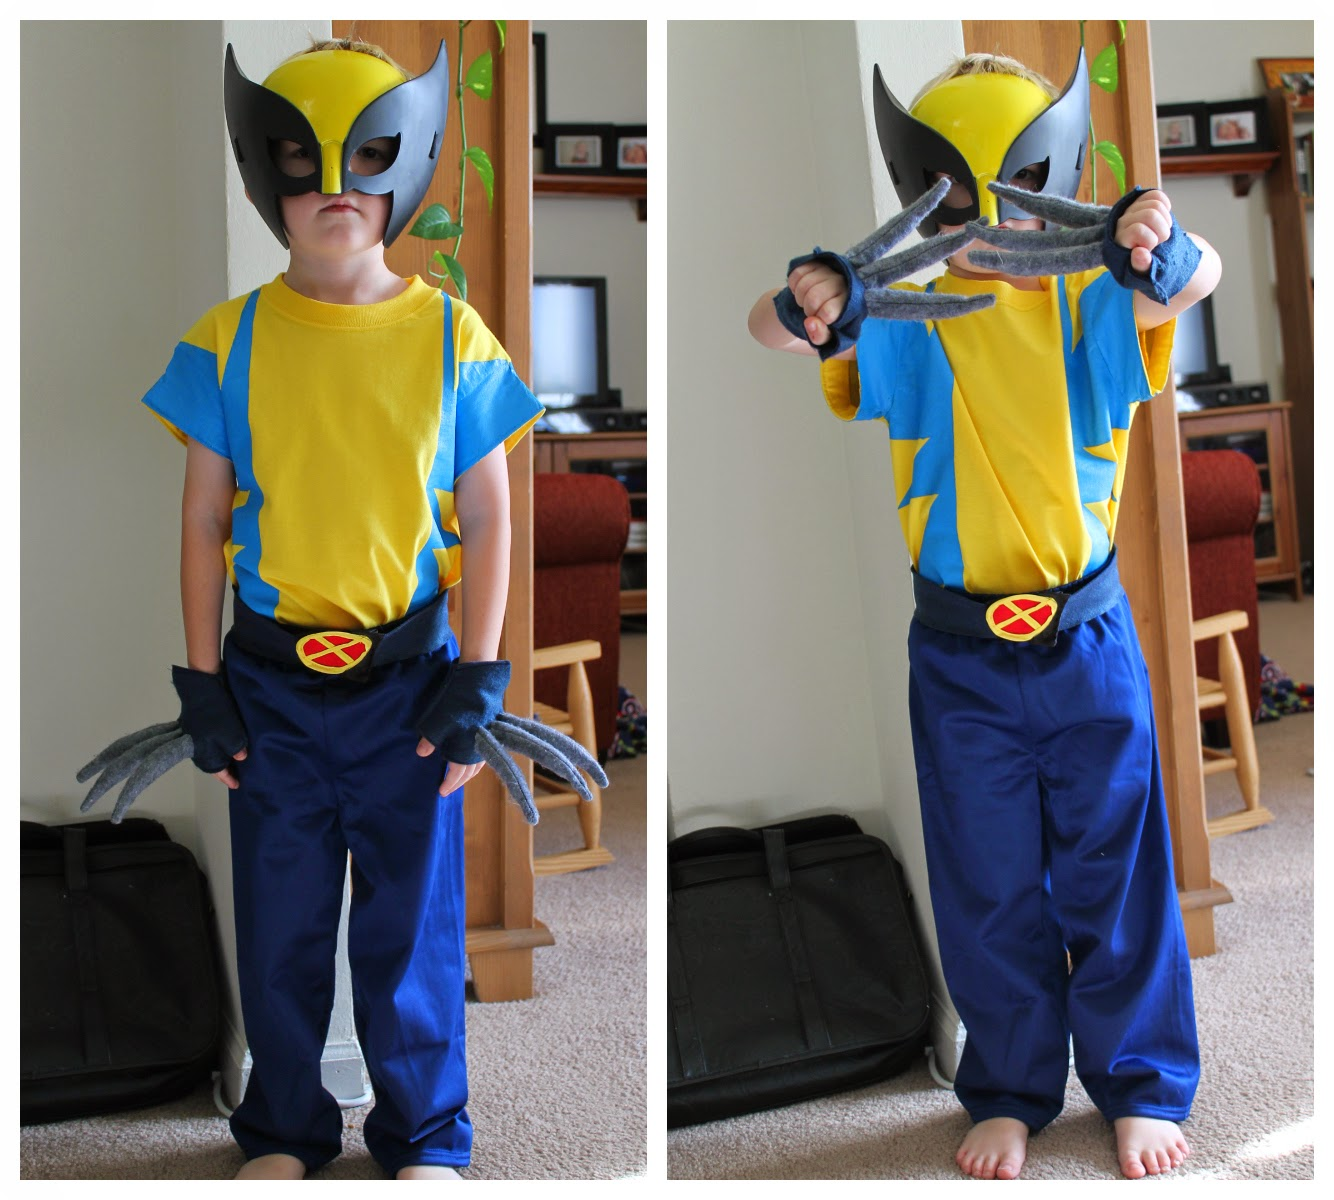 X-men Wolverine costume